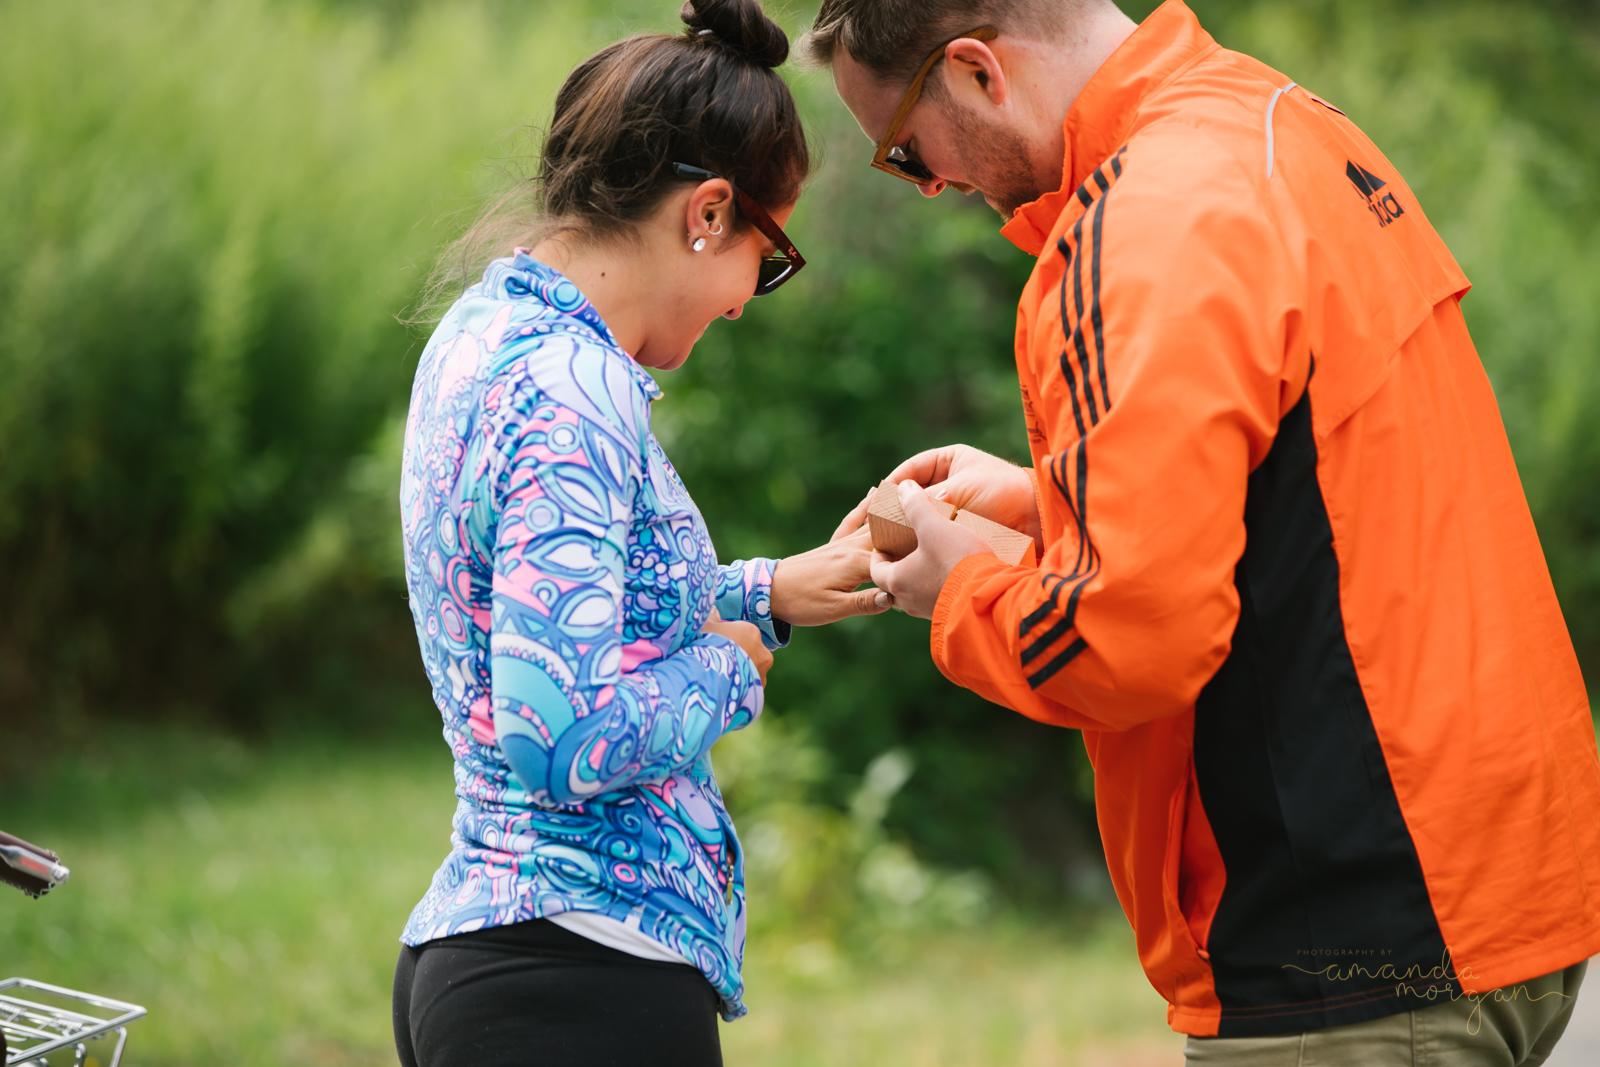 Surprise-Engagement-photos-amanda-morgan-8.jpg